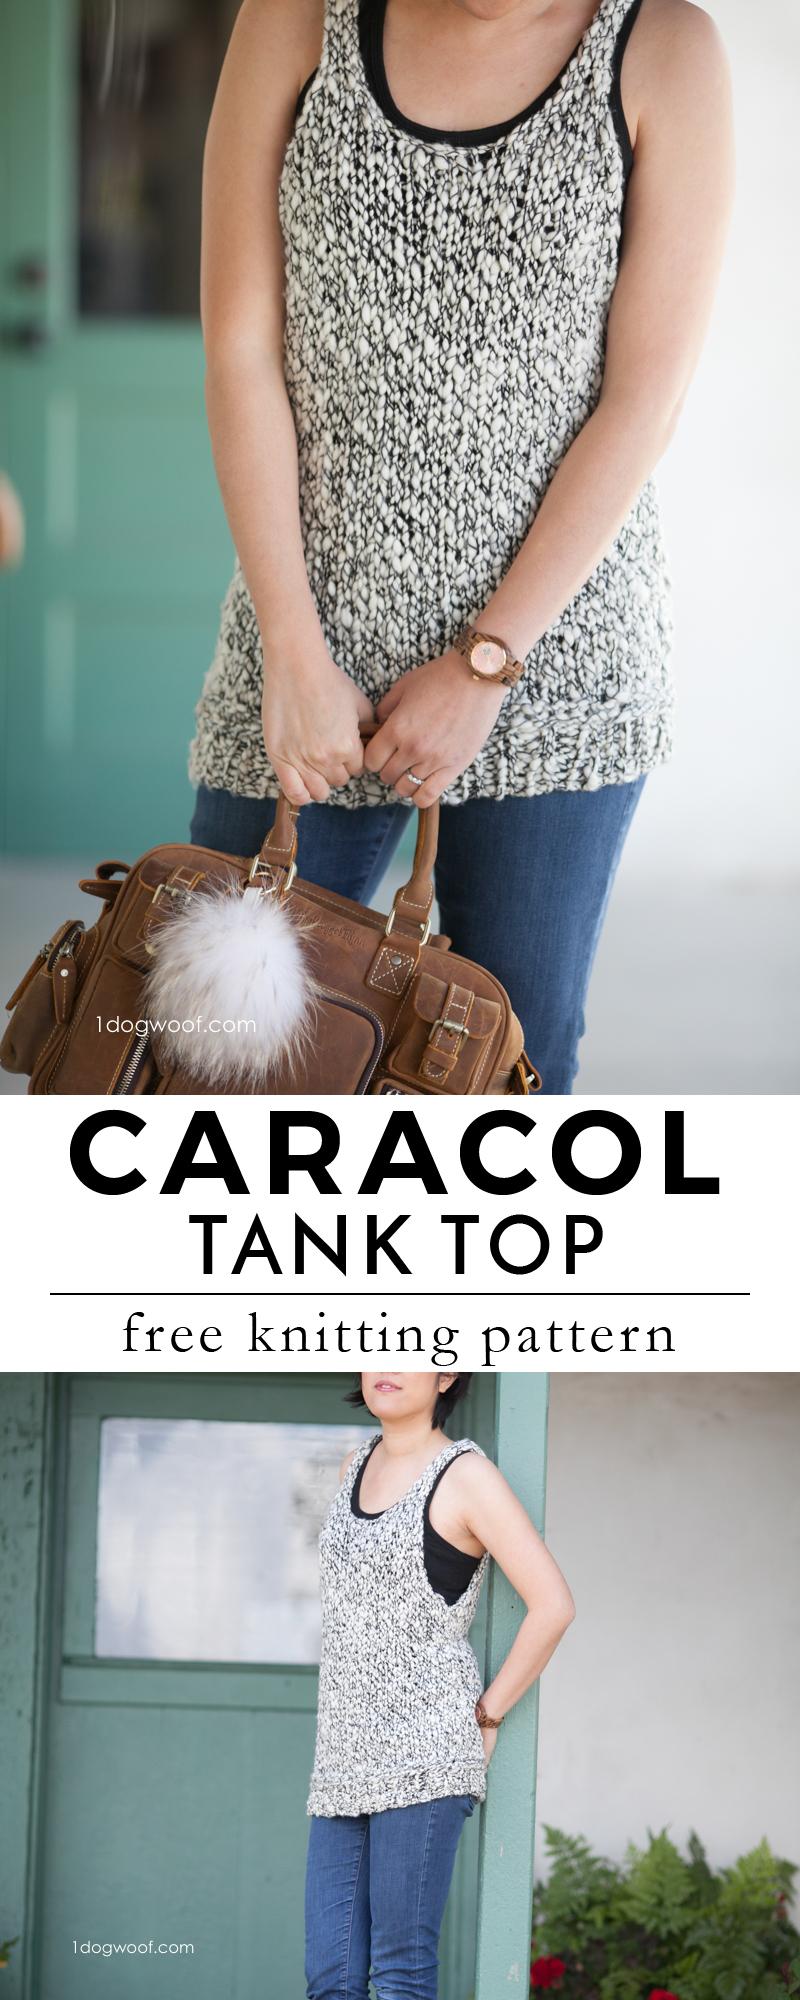 Caracol Tank Top Knitting Pattern by www.1dogwoof.com